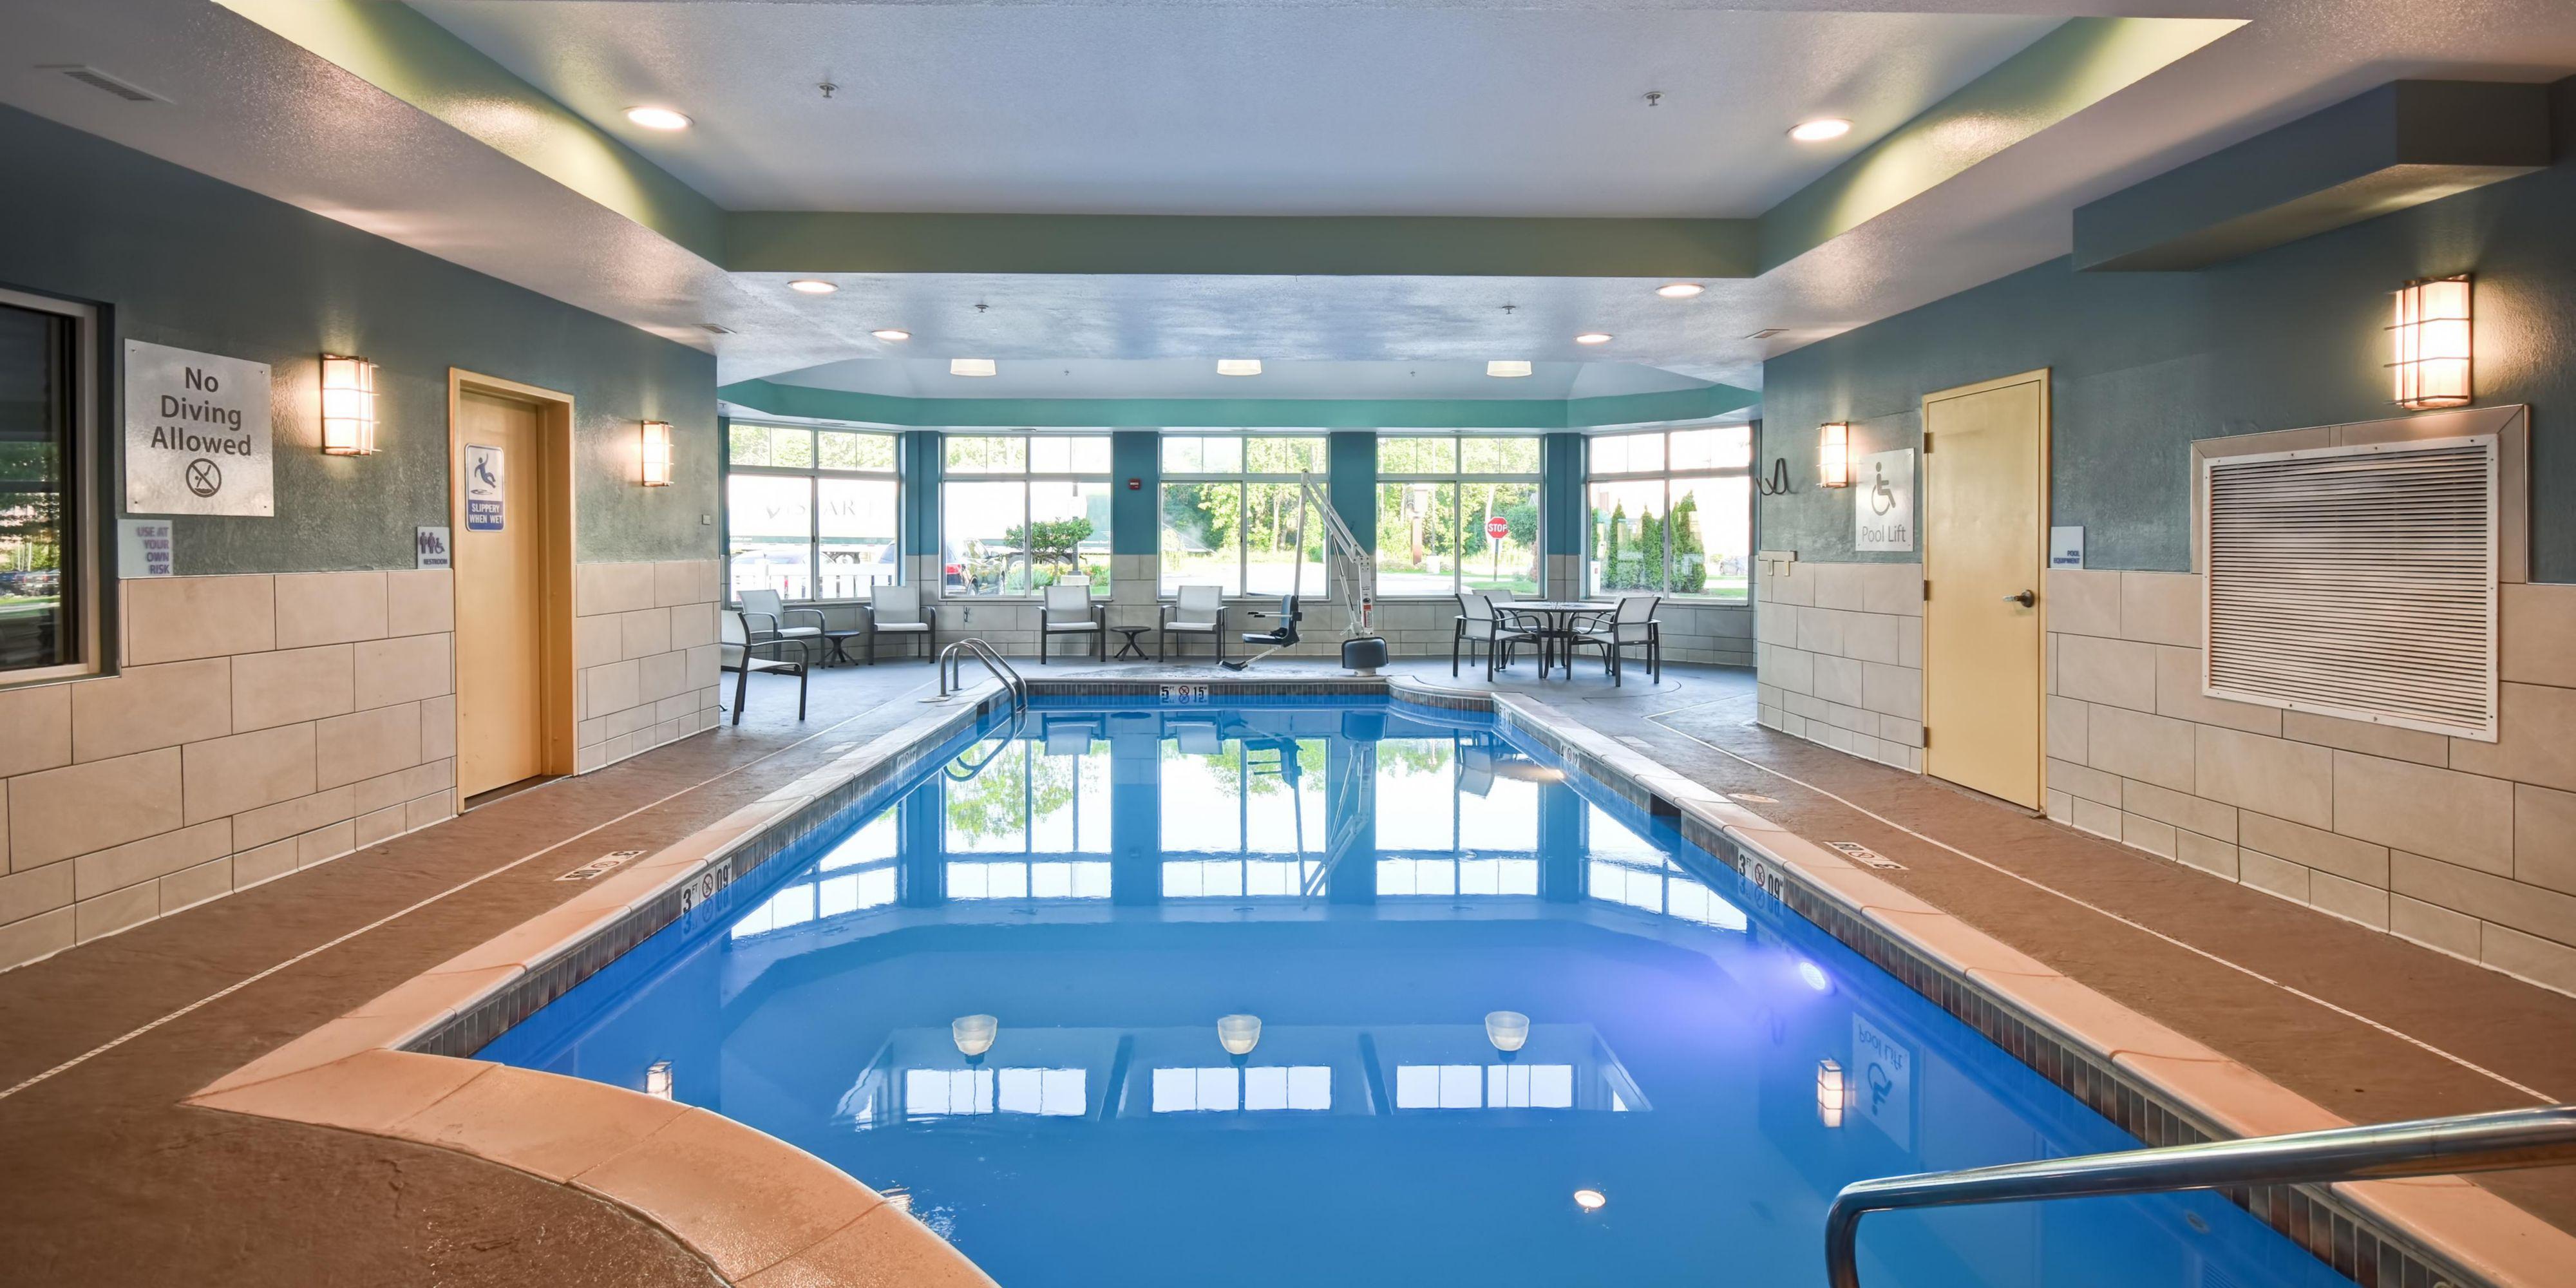 Holiday Inn Express And Suites Schererville 5628727178 2x1